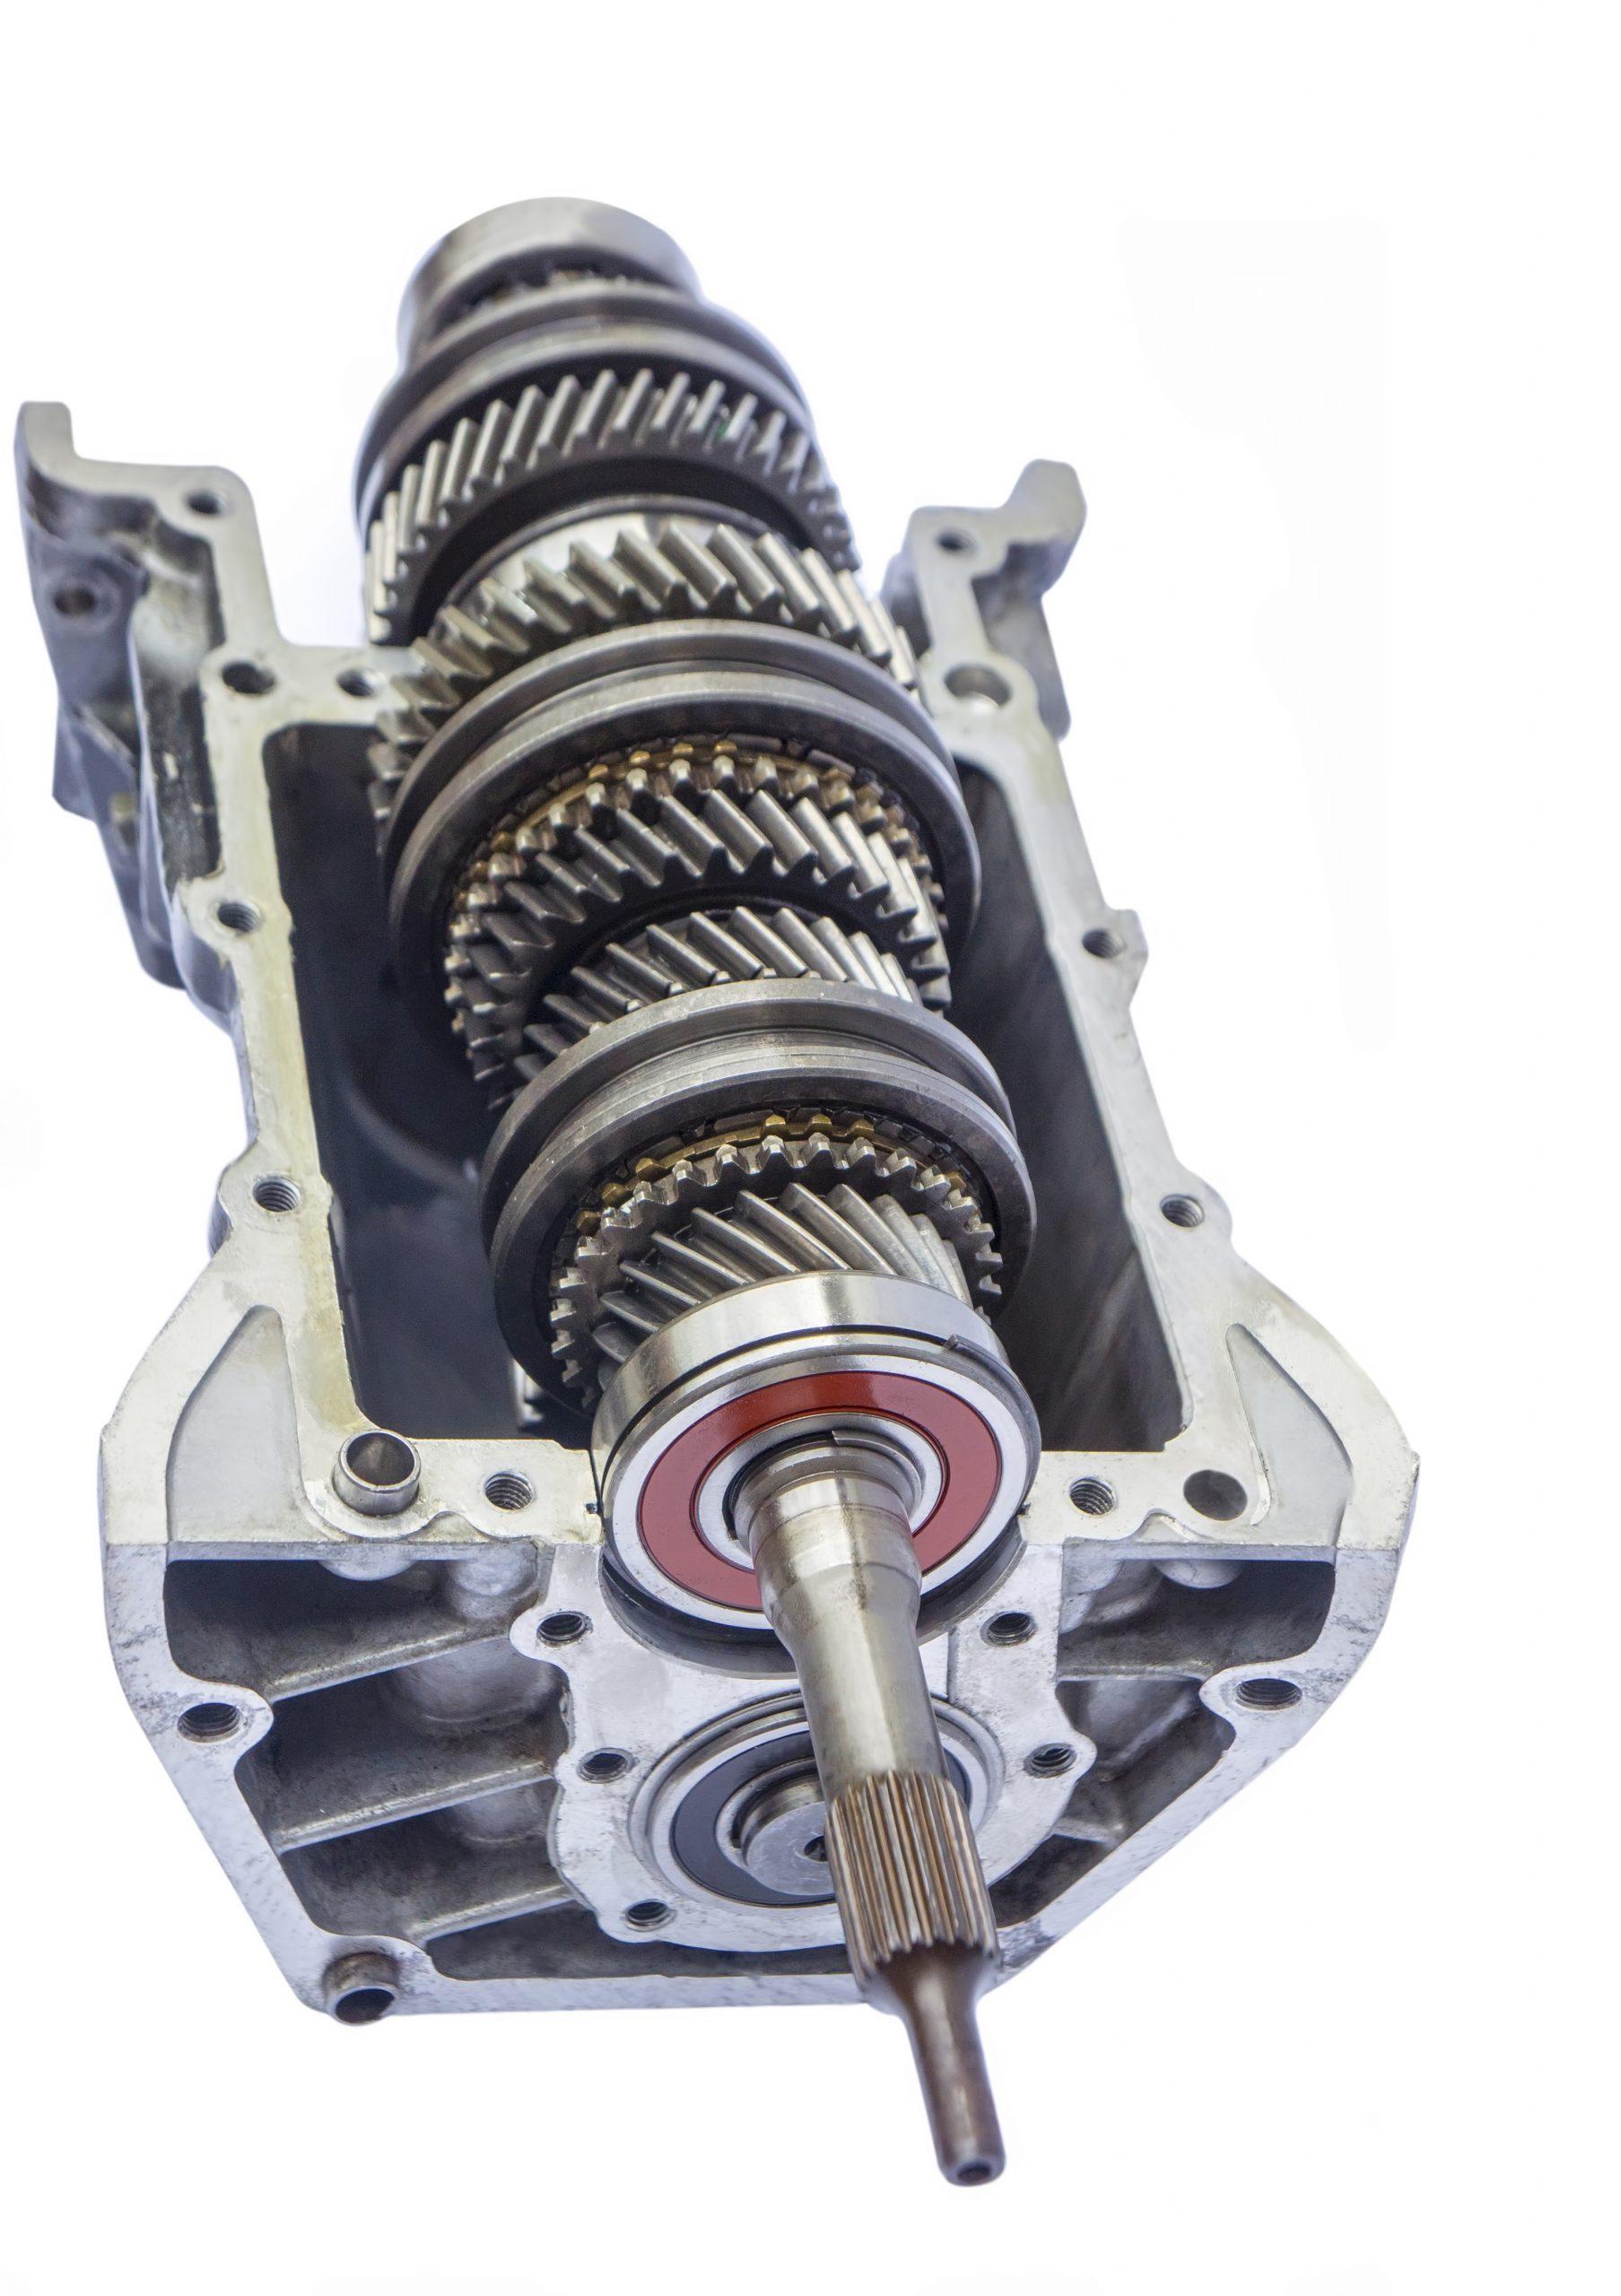 Performance gear box